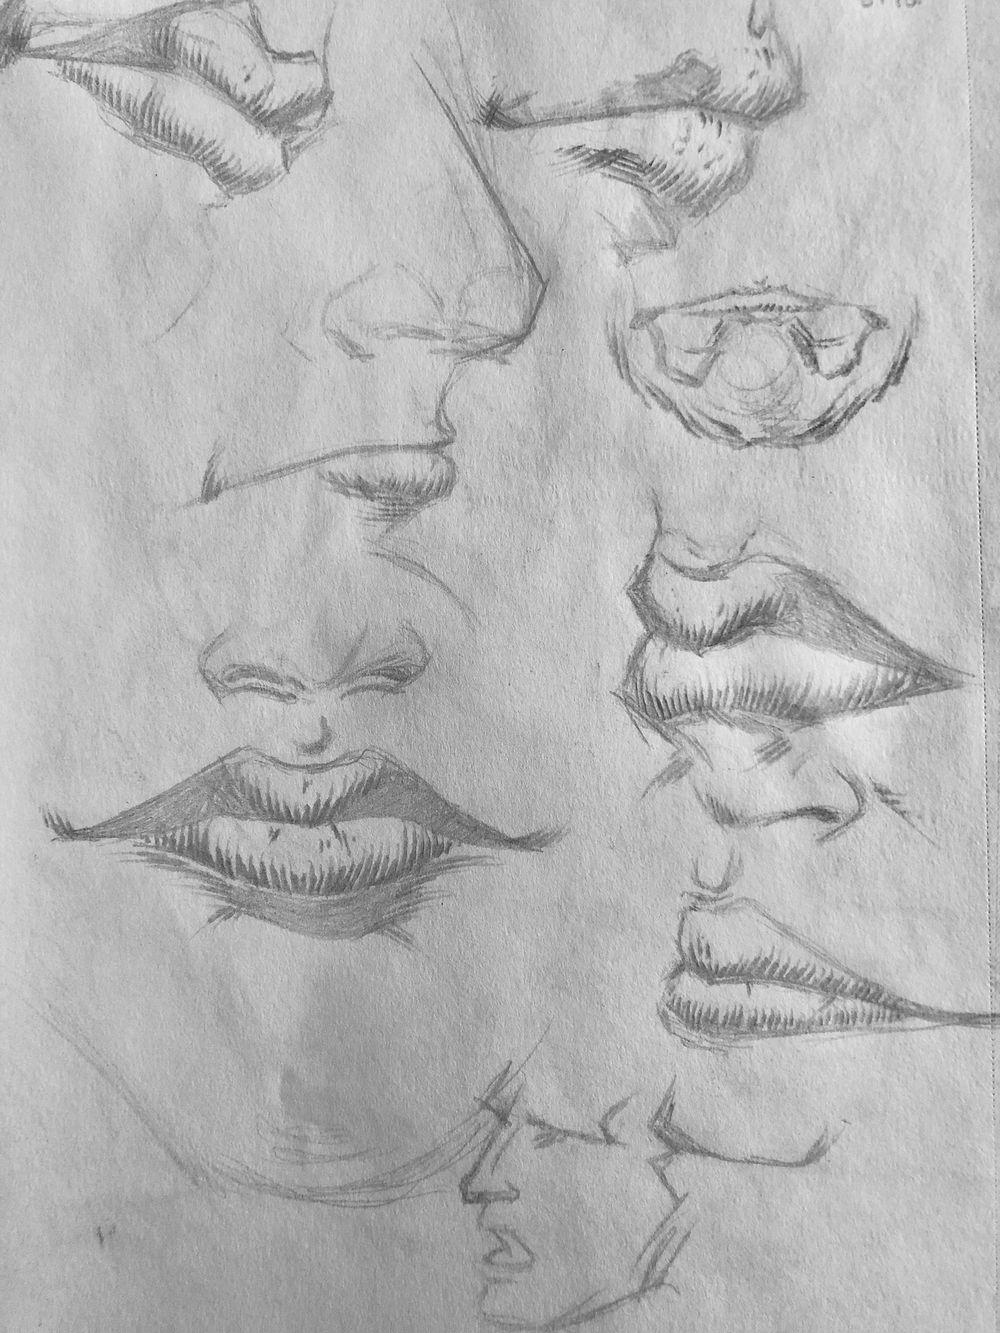 Superhero Head Studies - image 5 - student project